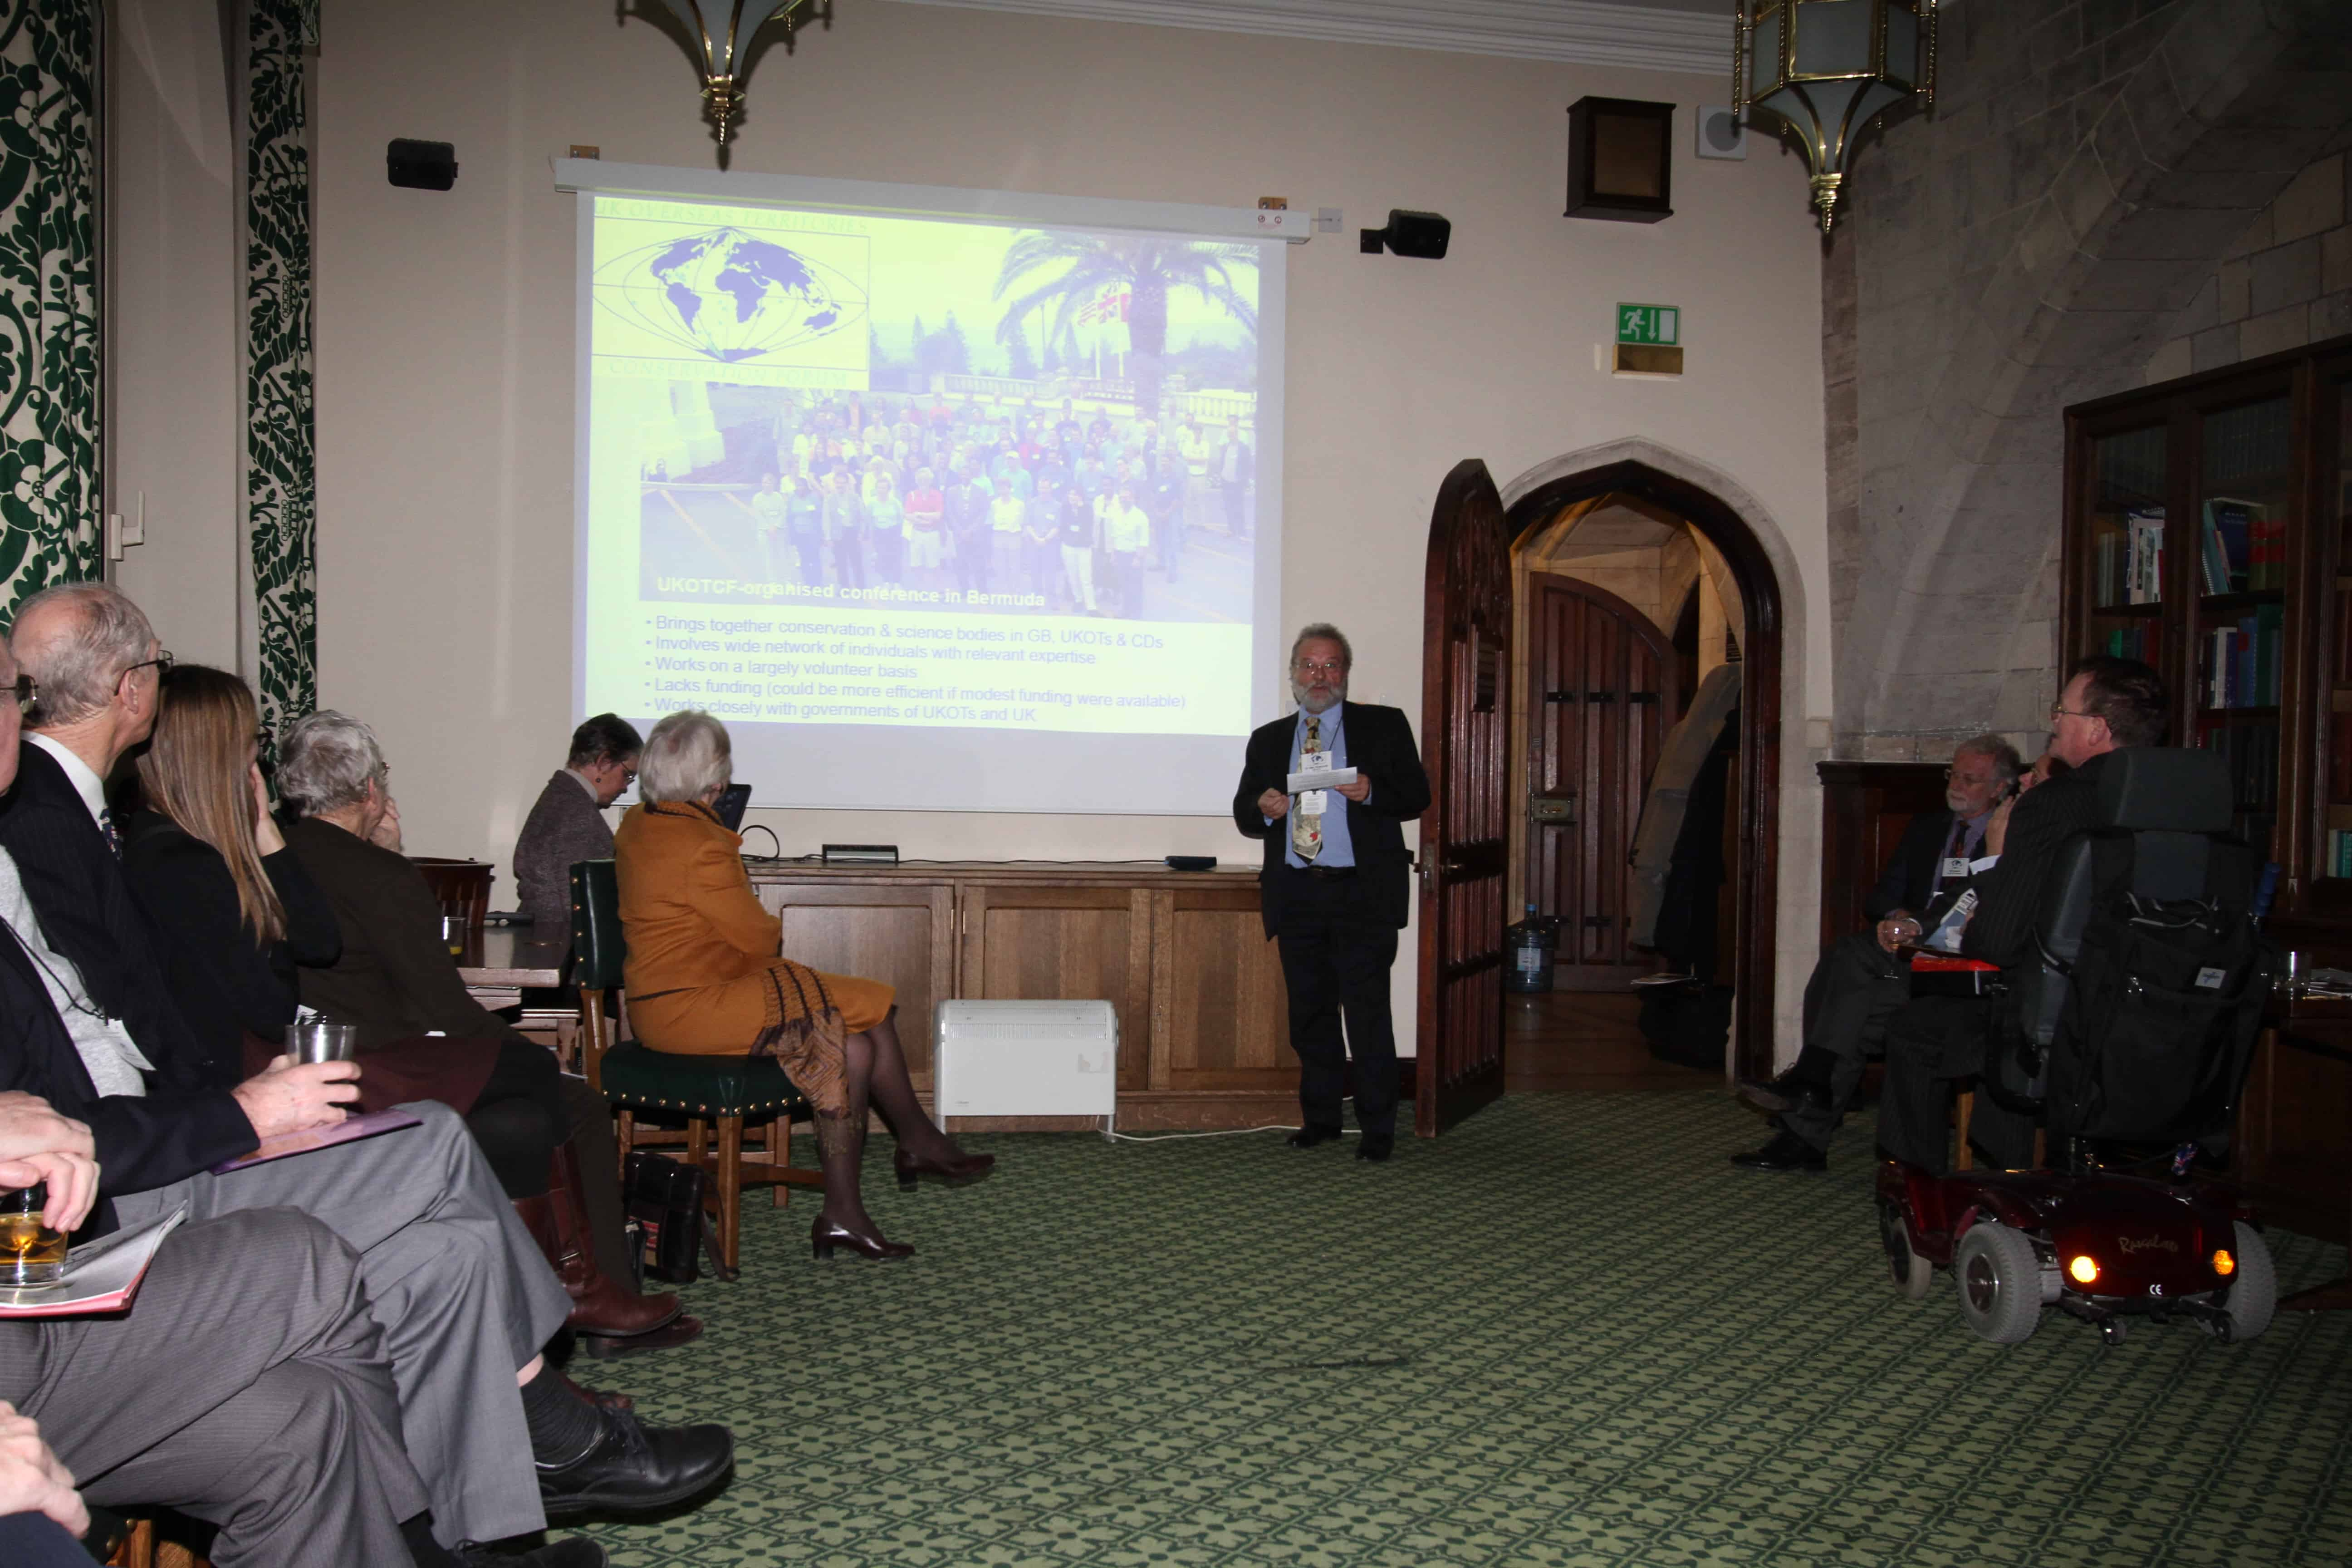 Dr Mike Pienkowski addresses Parliamentarians at UKOTCF/APPG Reception. Copyright: UKOTCF